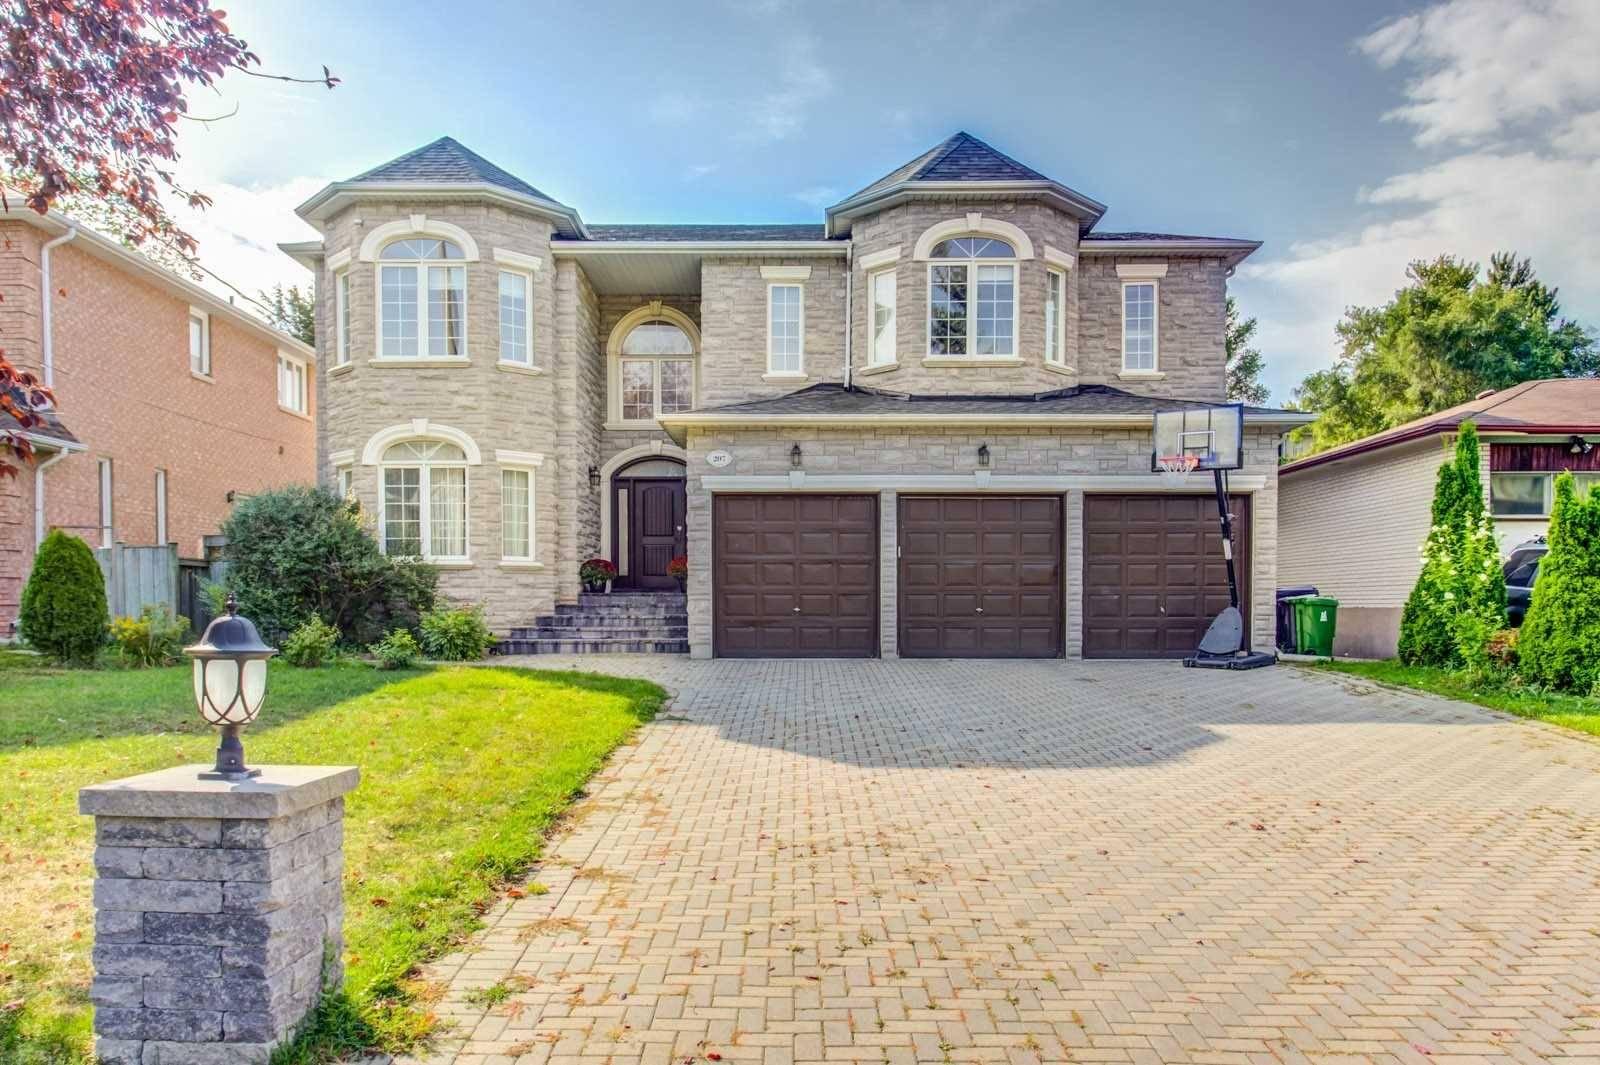 House for sale at 207 Pemberton Ave Toronto Ontario - MLS: C4673614